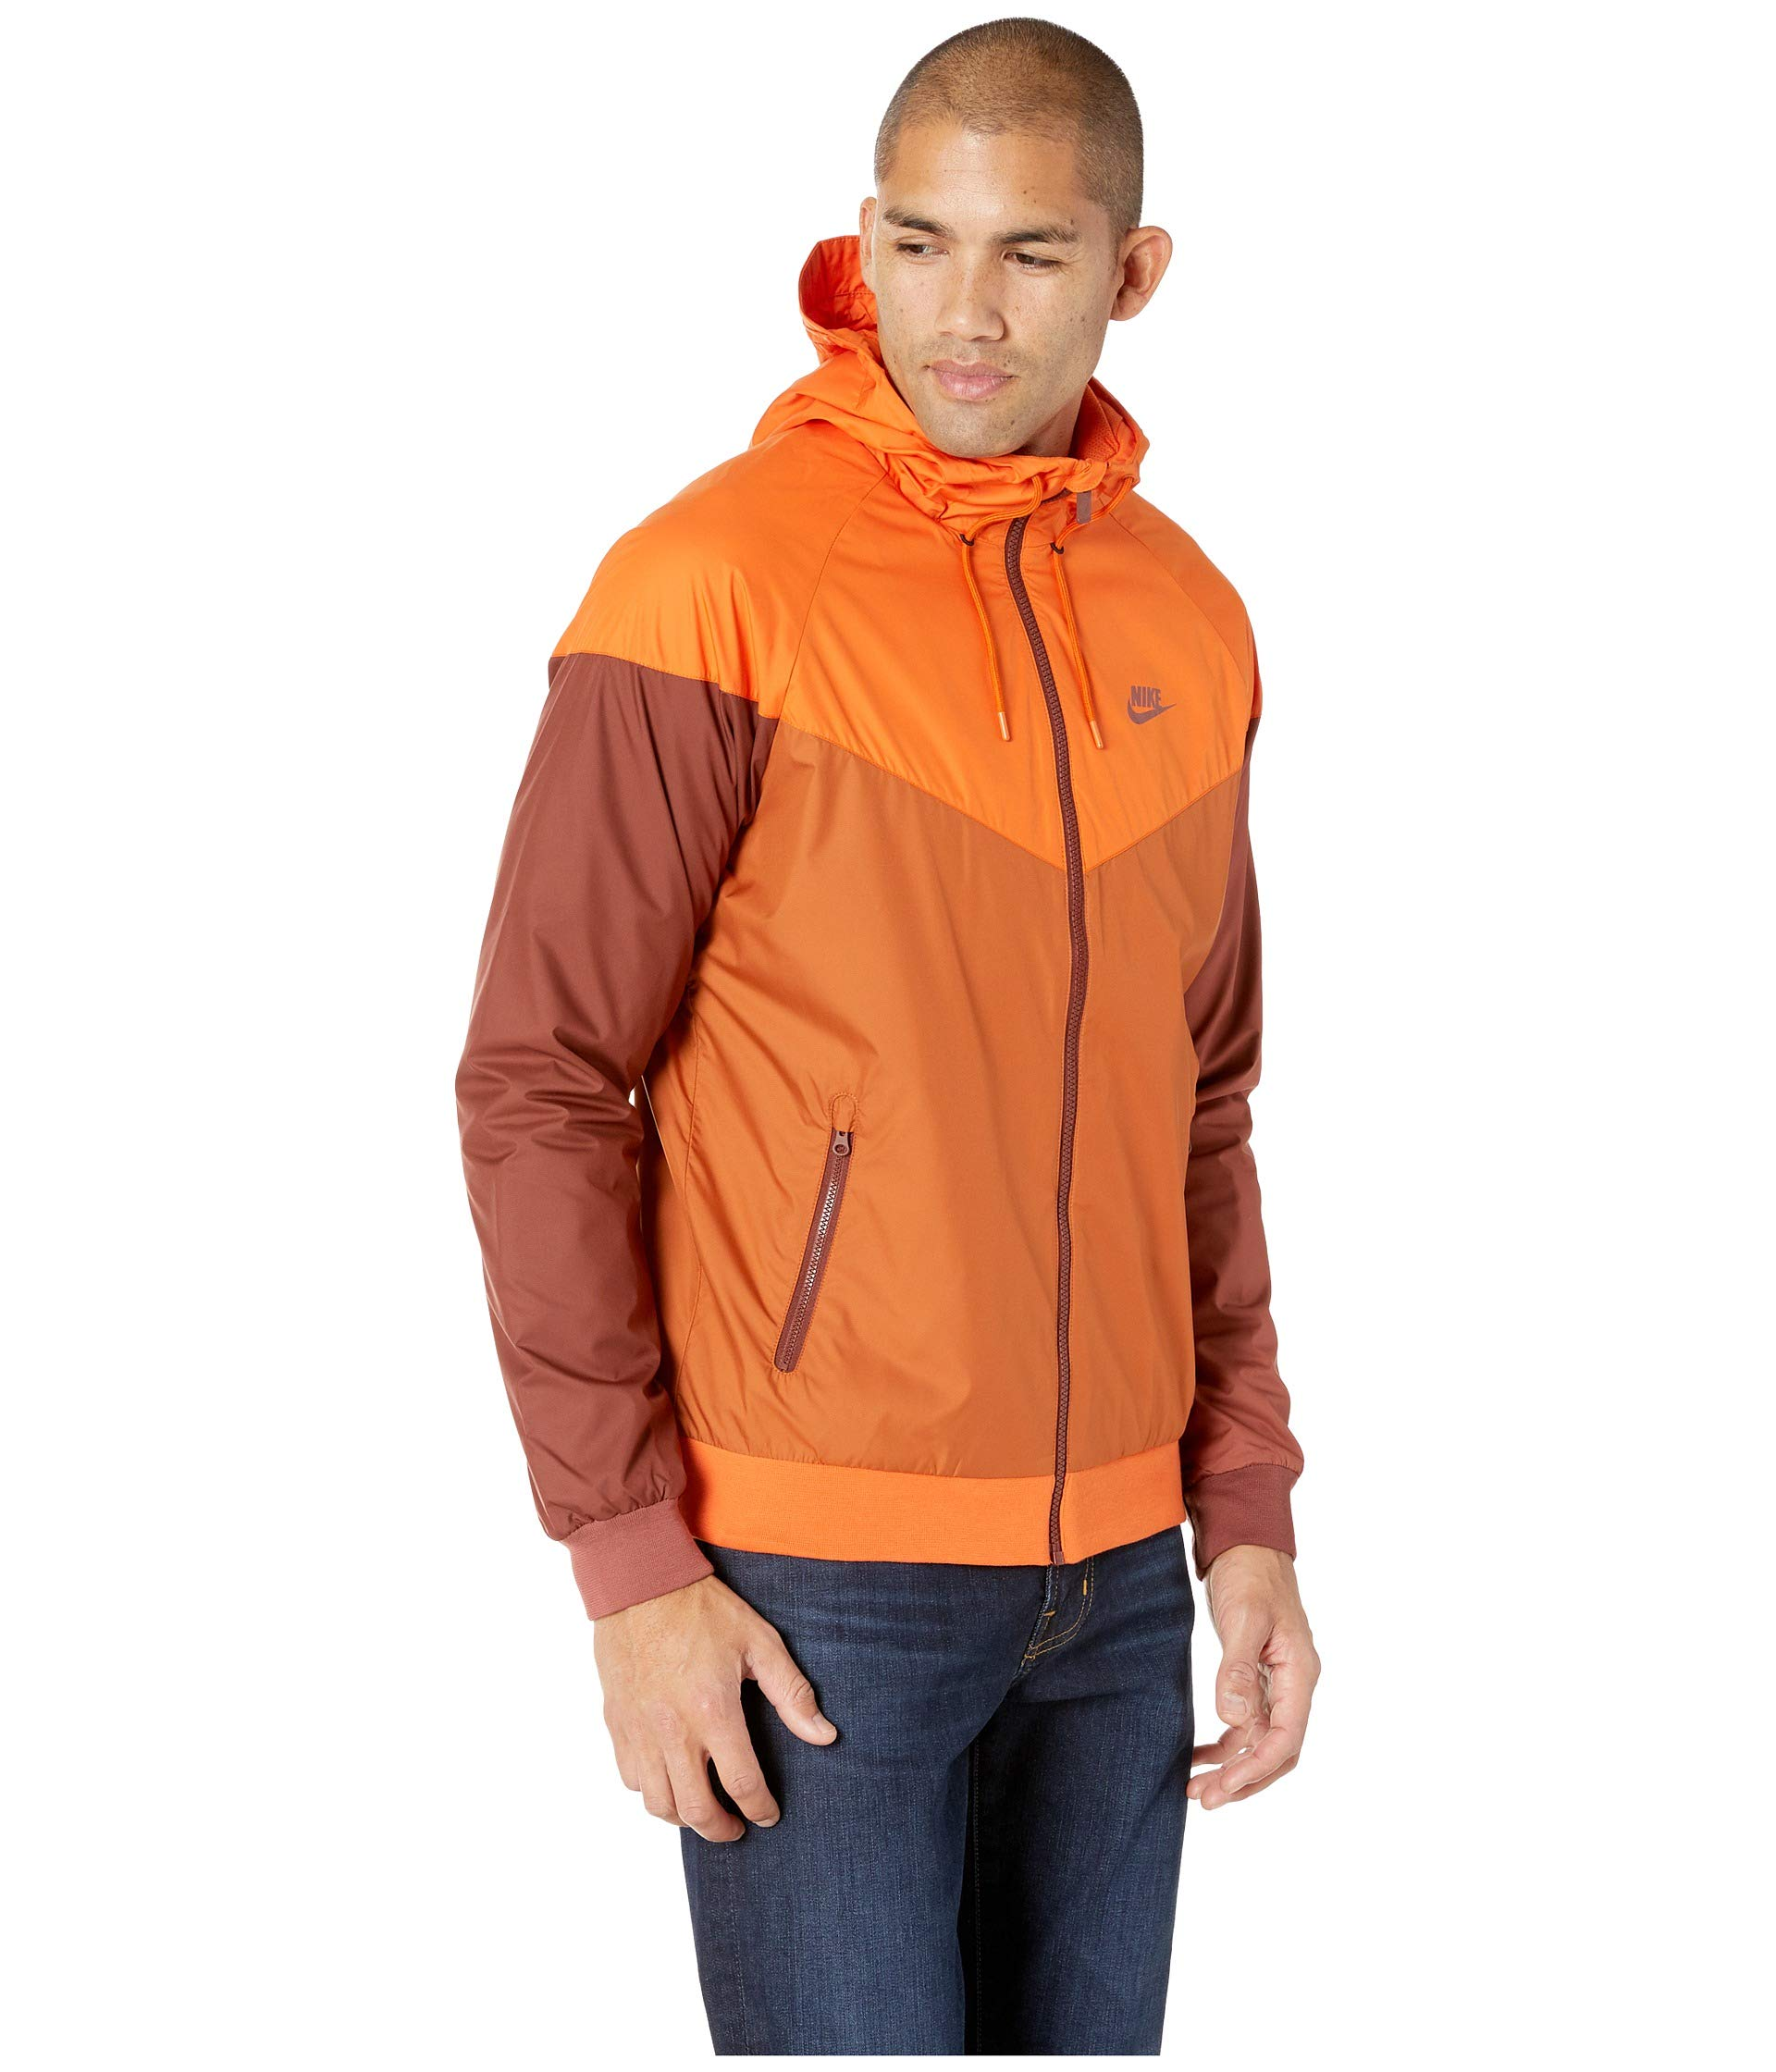 Nike Men's Windrunner Full Zip Jacket (Cmpfre Ornge/Dk Russet/Small) by Nike (Image #5)